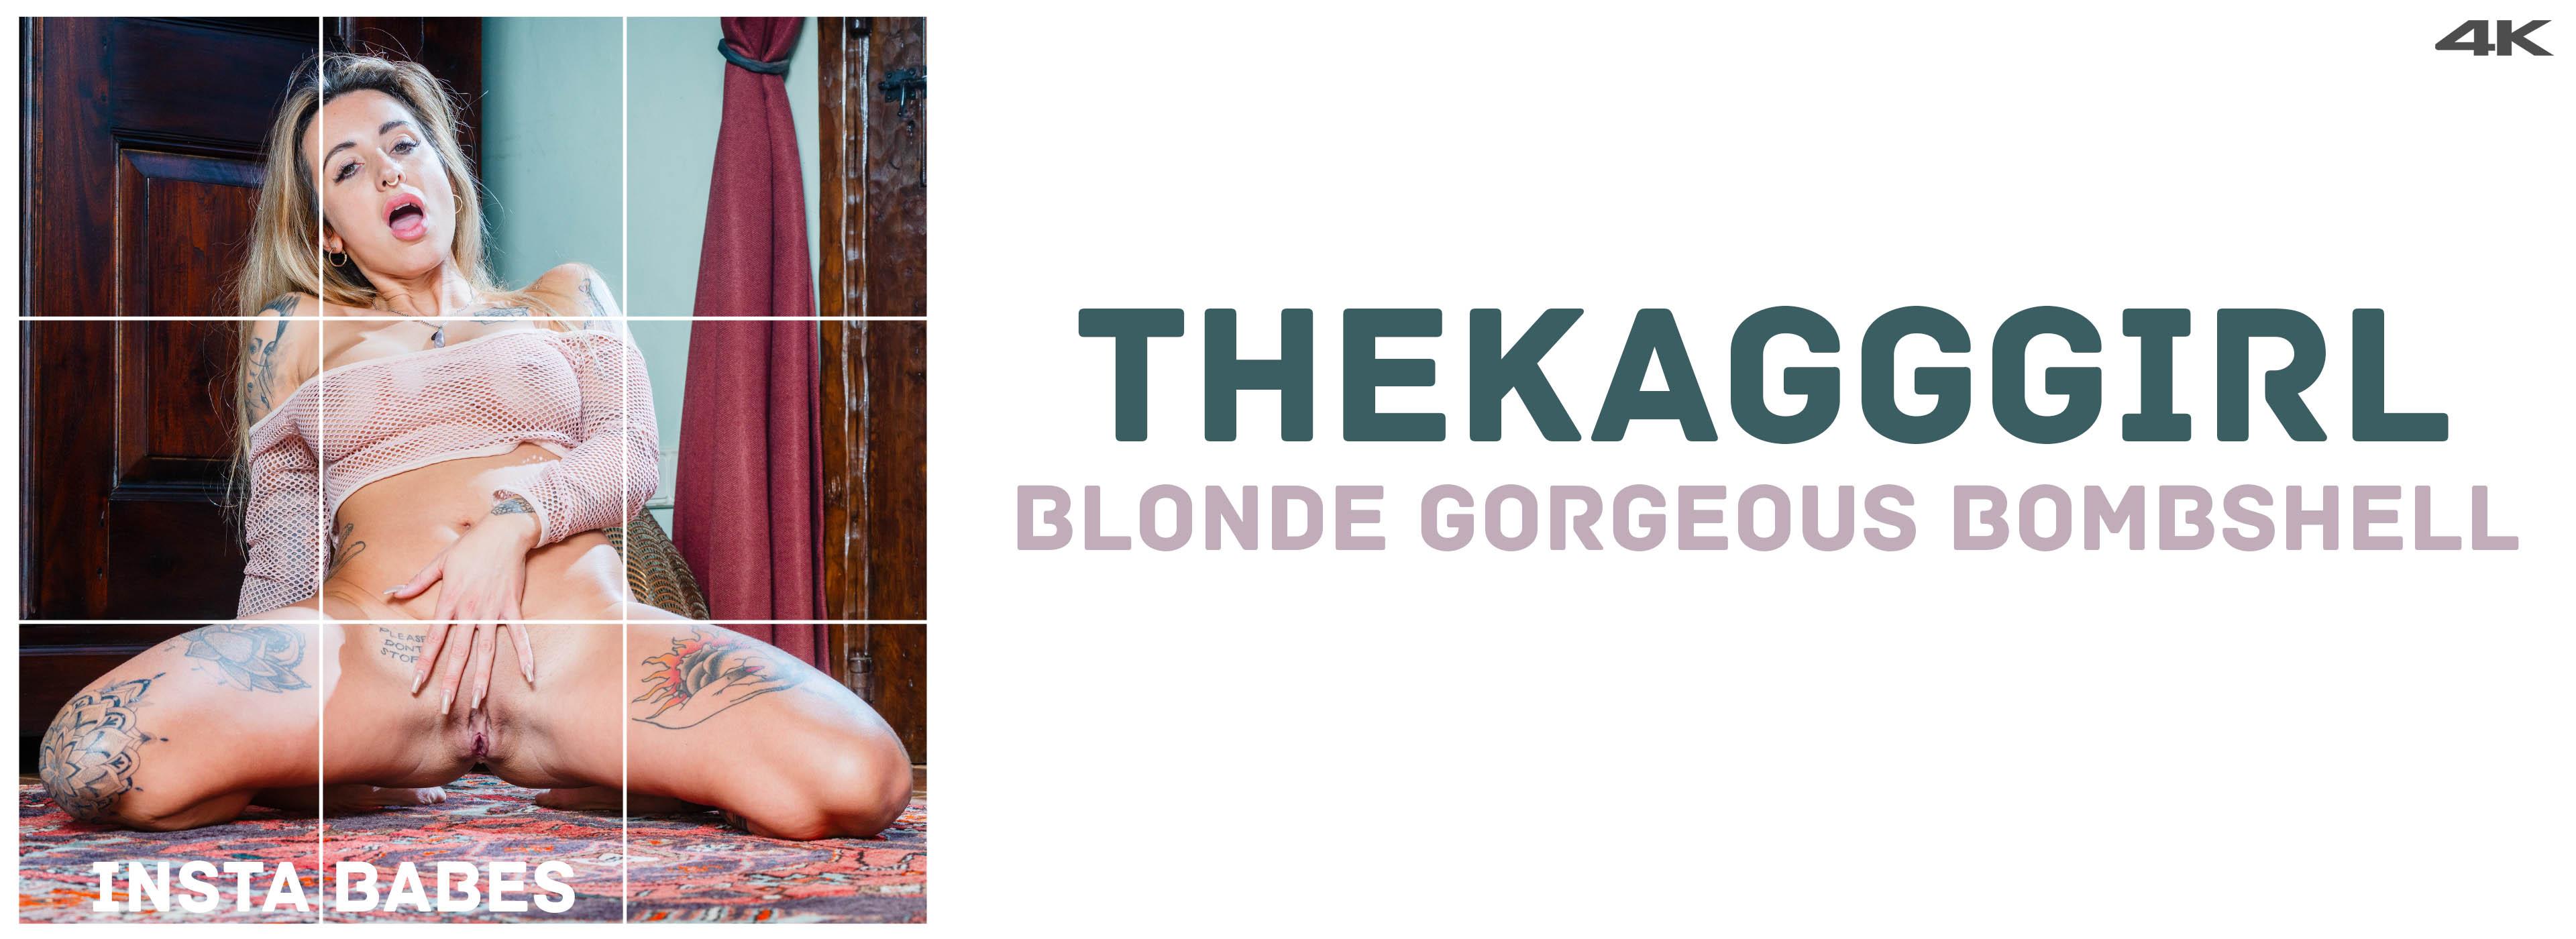 TheKaGGGirl | Blonde Gorgeous Bombshell